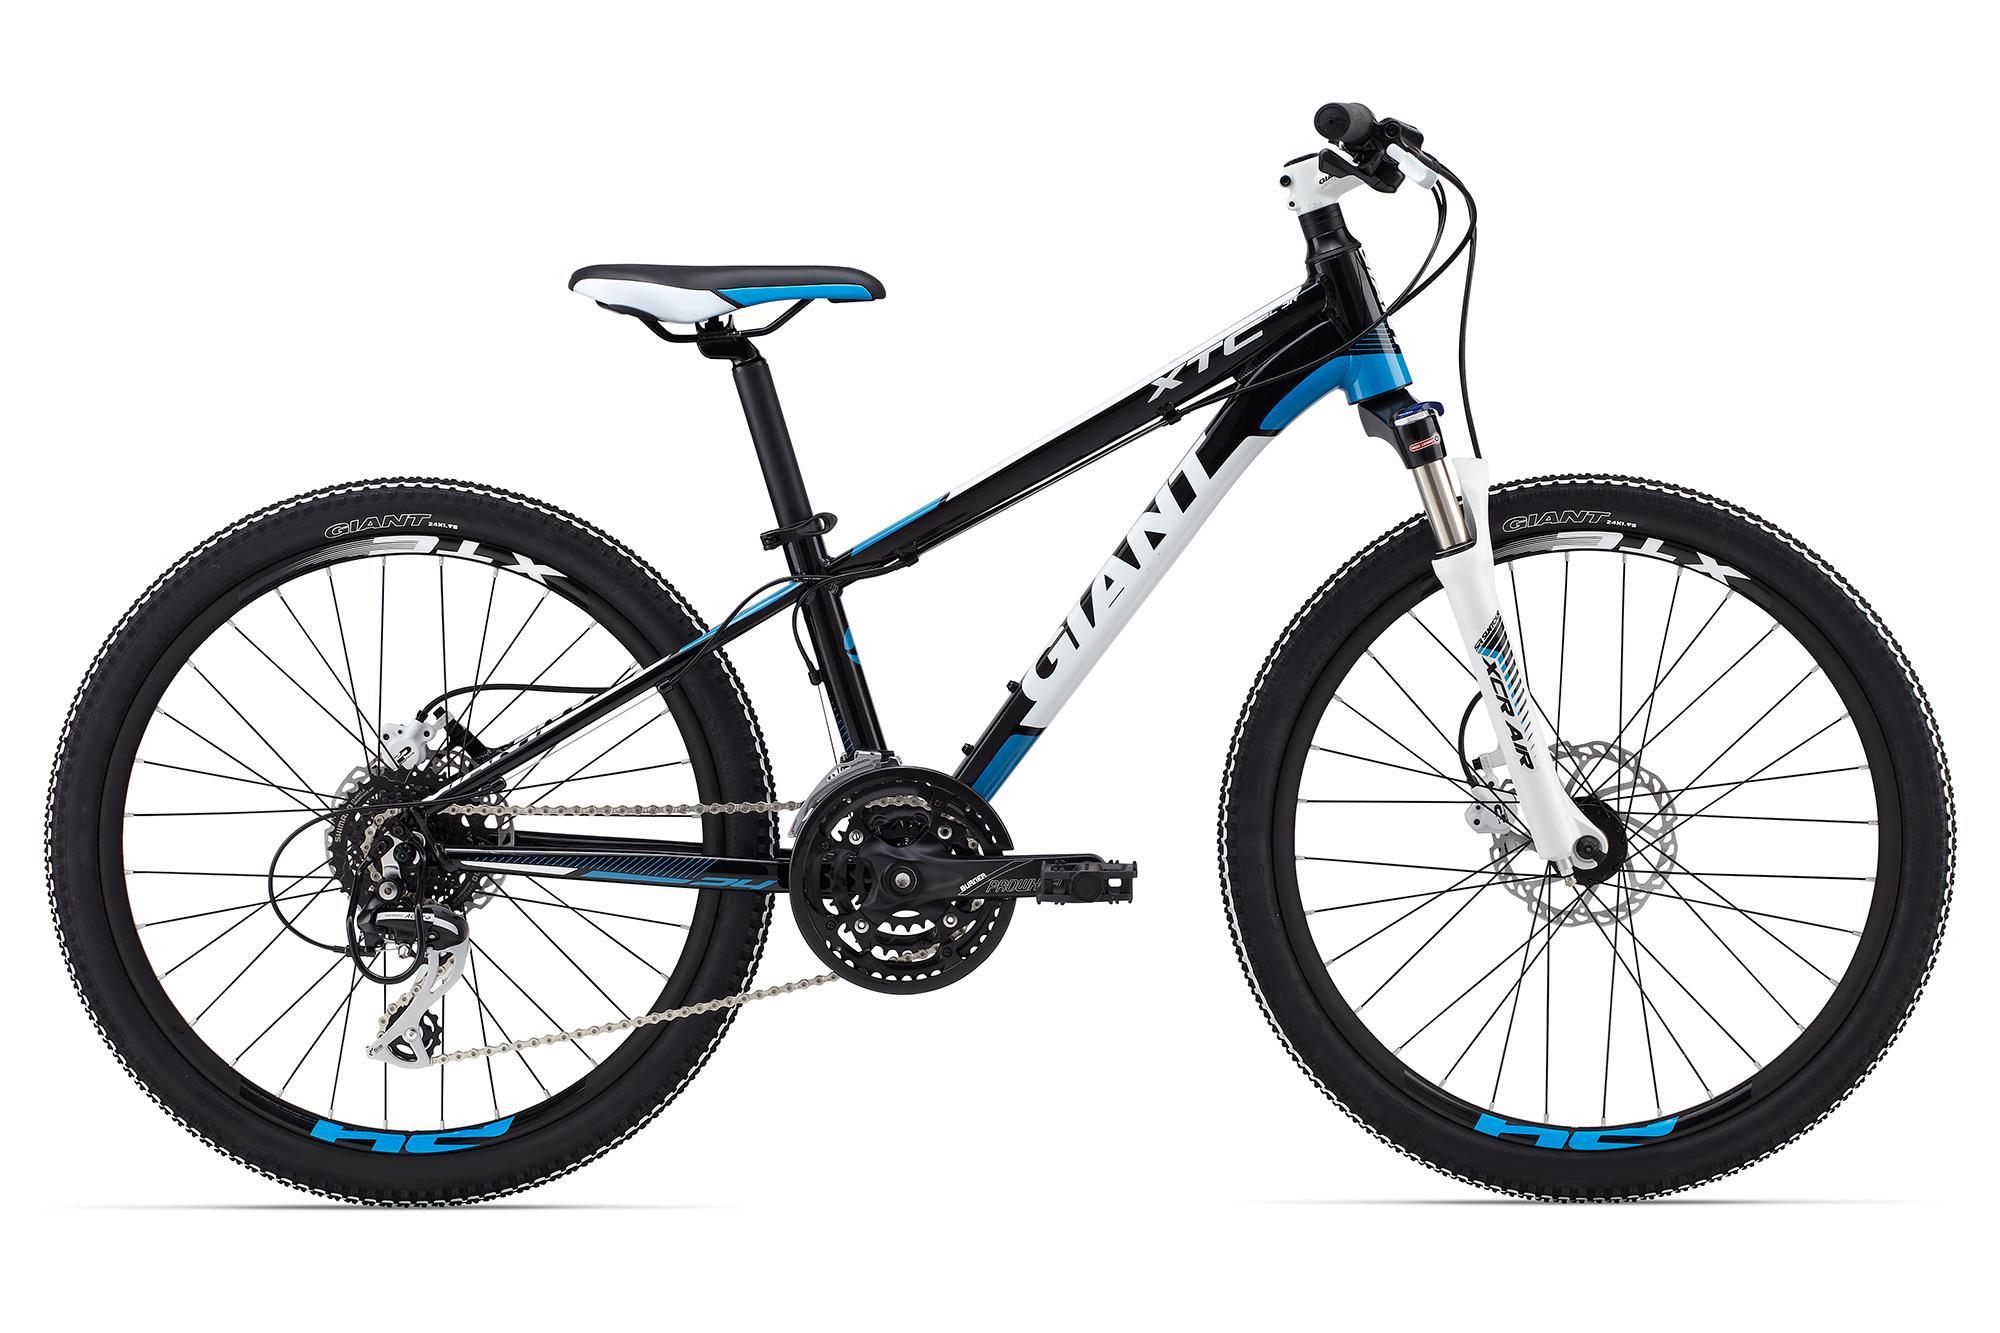 Xe dap the thao dia hinh GIANT XTC SL Jr 24, xe dap the thao, xe dap trinx, xe đạp thể thao chính hãng, xe dap asama, XtC SL Jr 24 Black